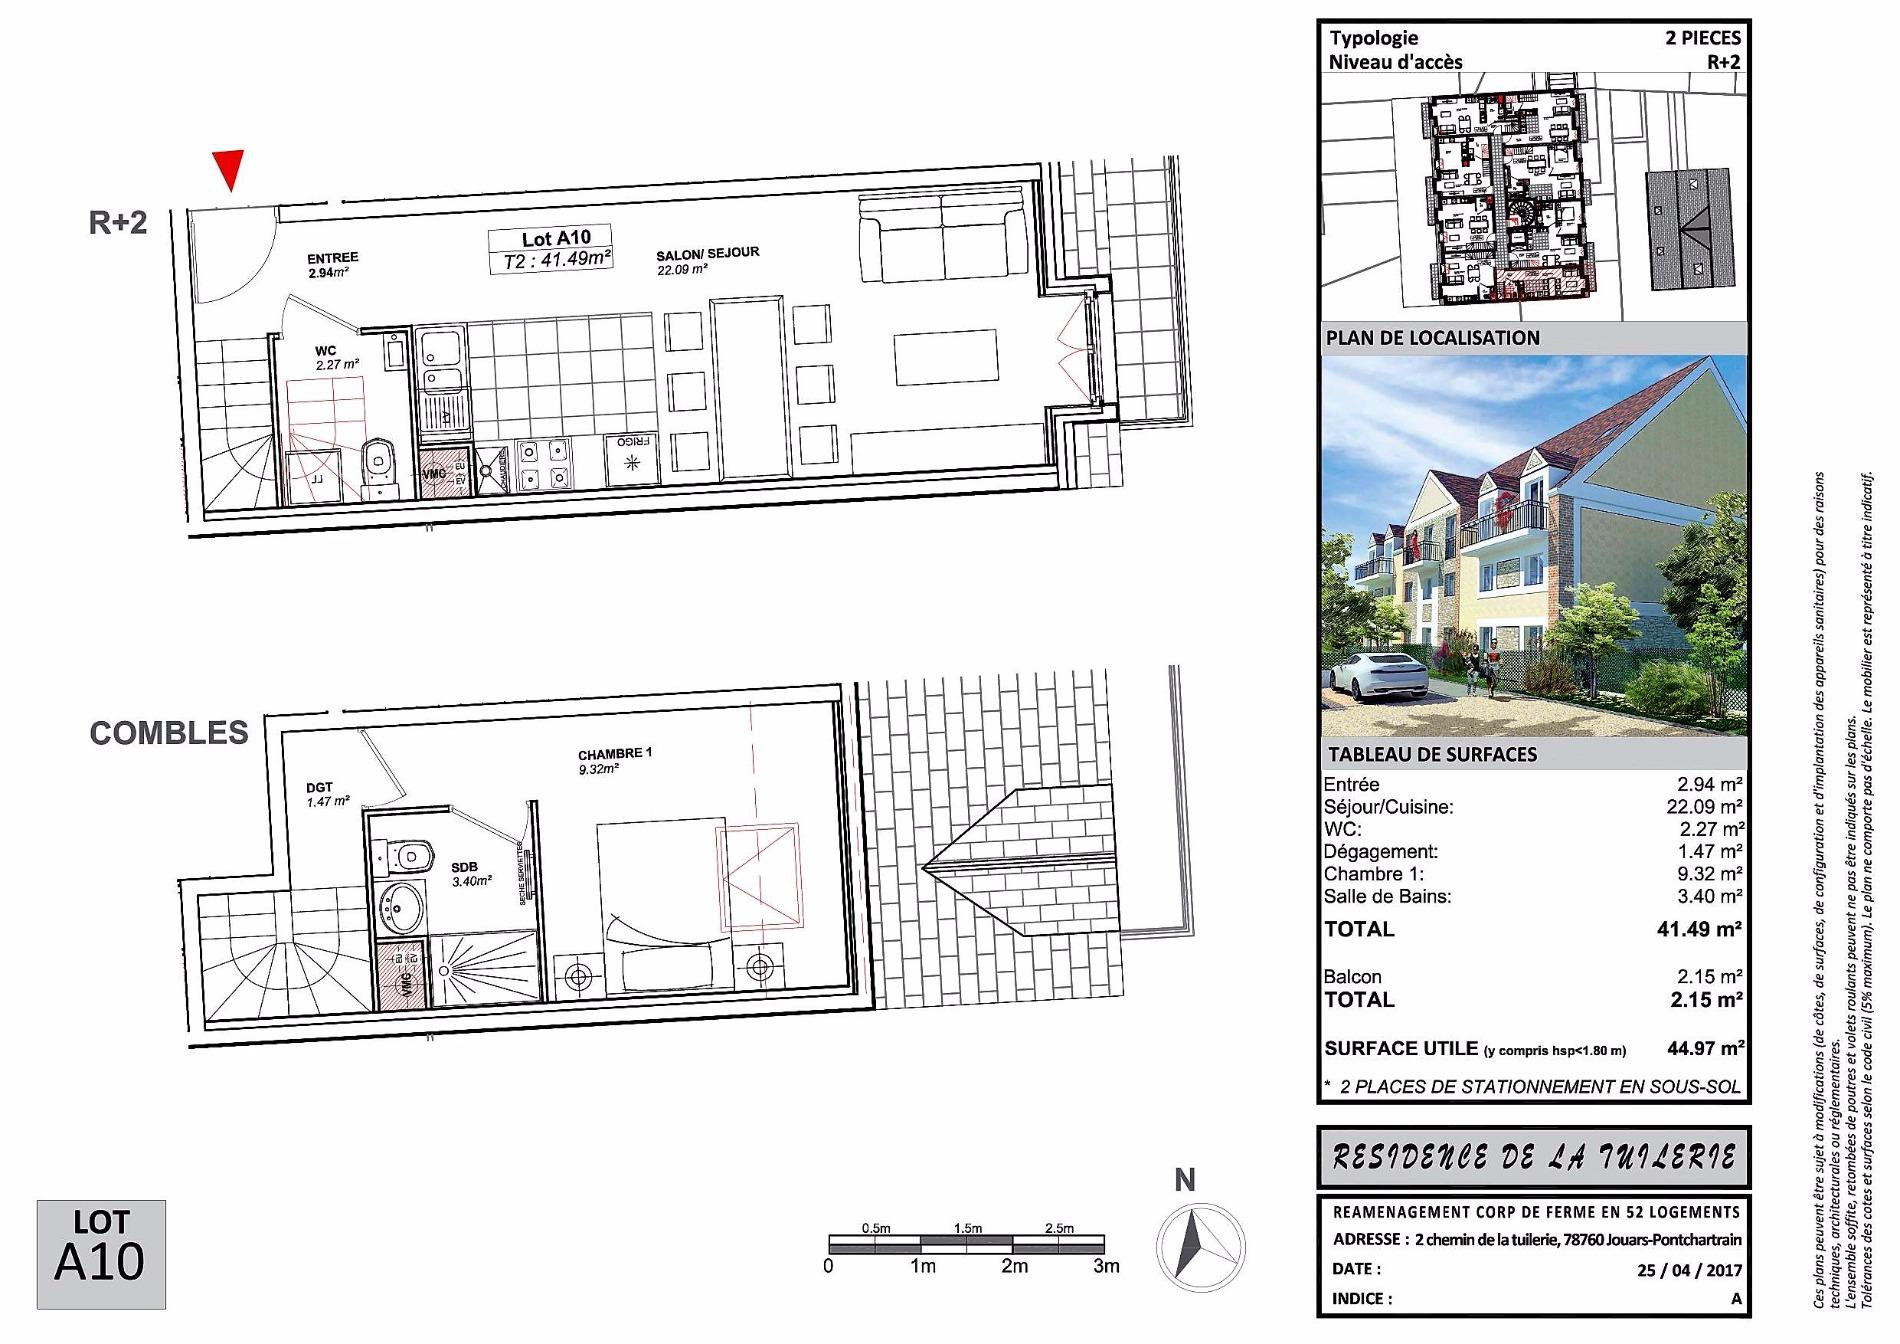 Offres programmes neufs duplex 2 pi ces for Agence immobiliere jouars pontchartrain